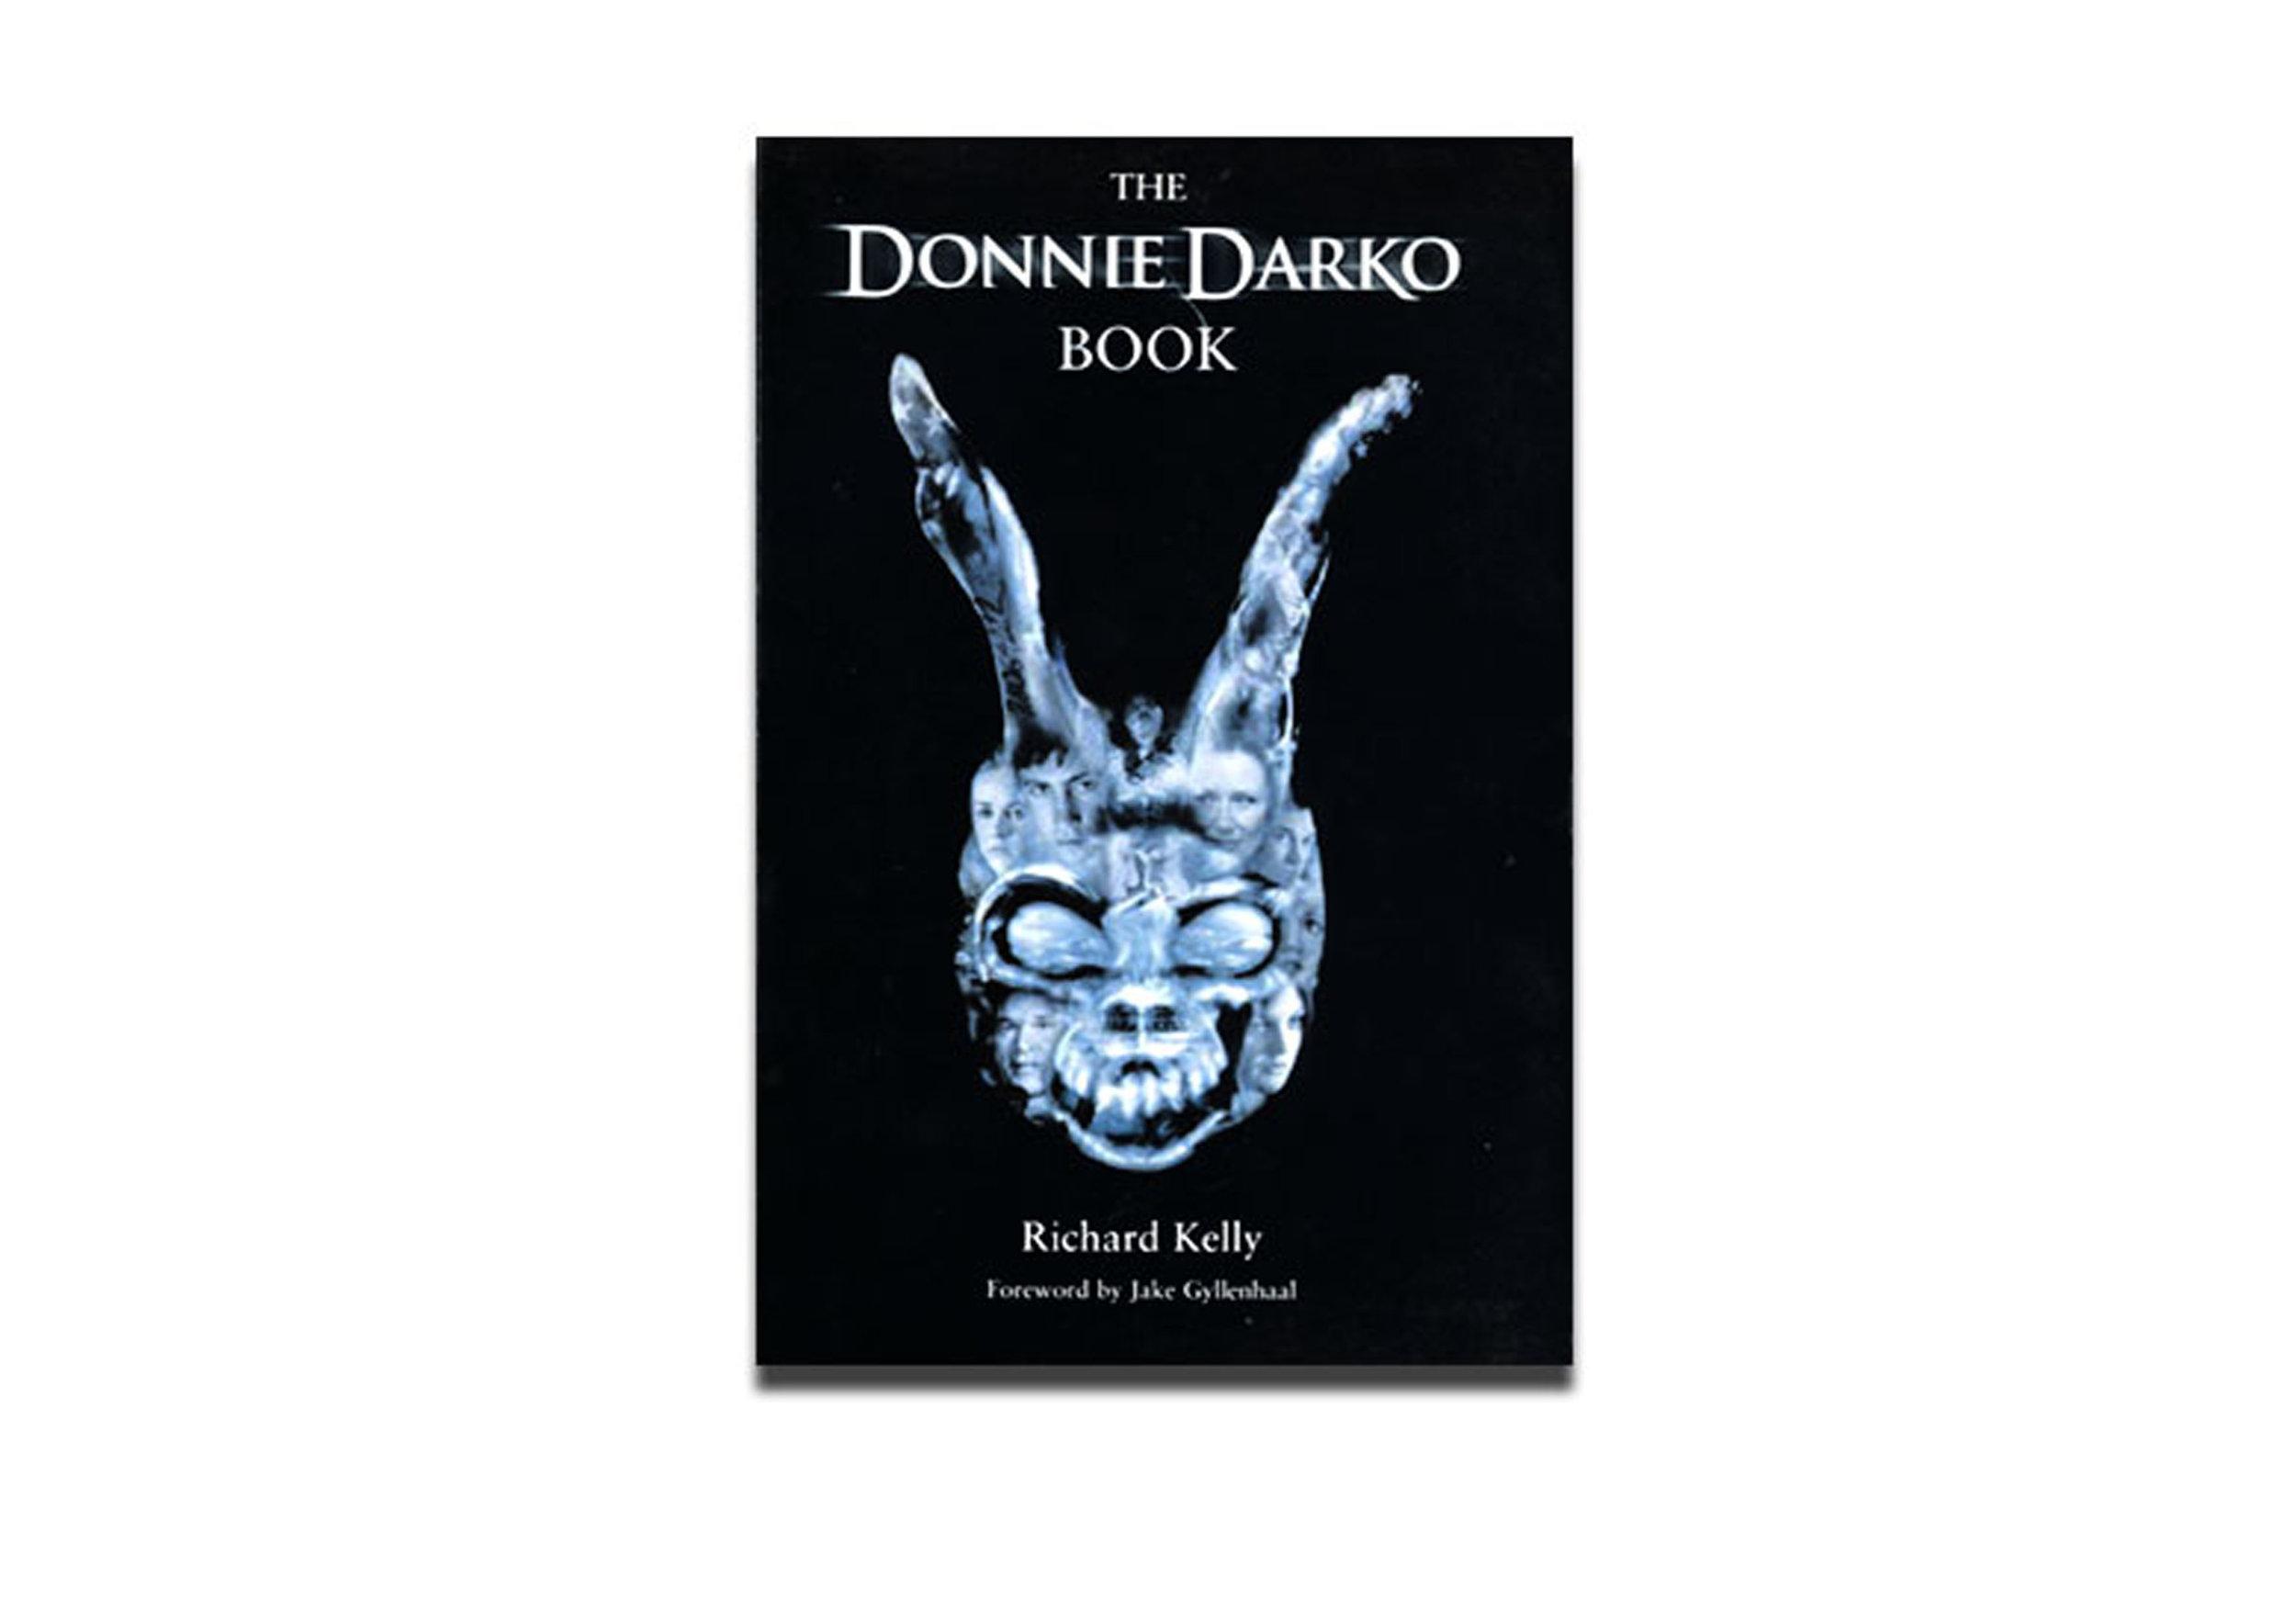 The Donnie Darko Book  by Richard Kelly